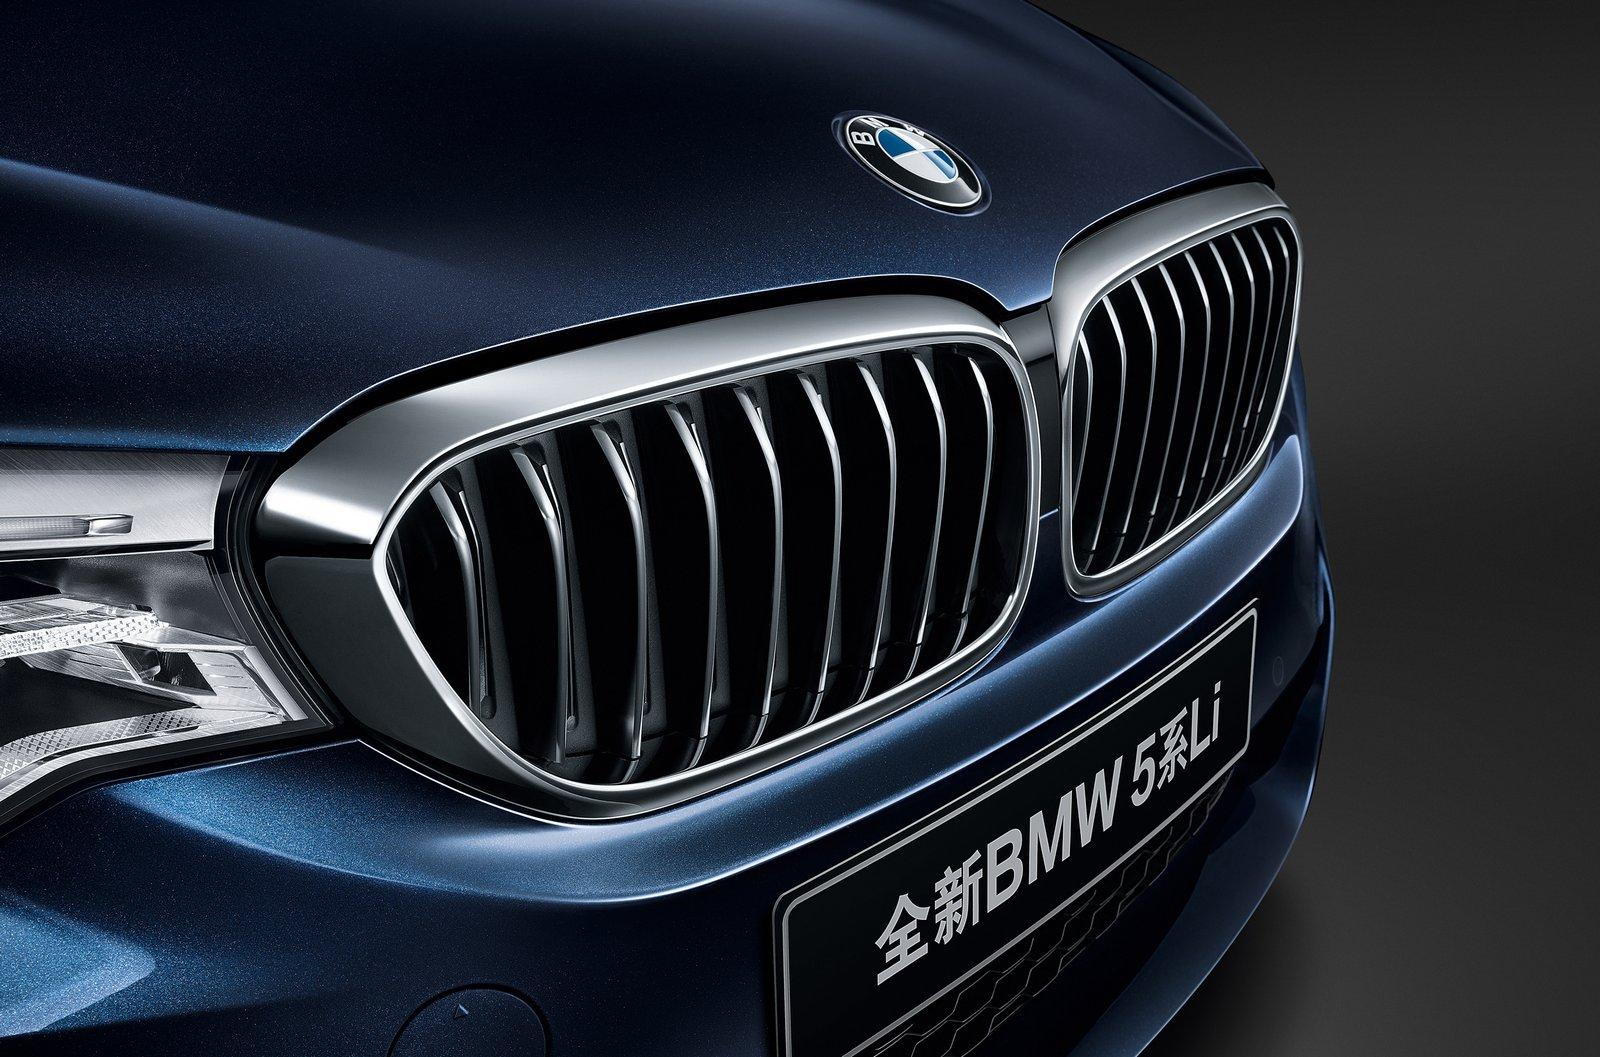 BMW-5-Series-LWB-12.jpg